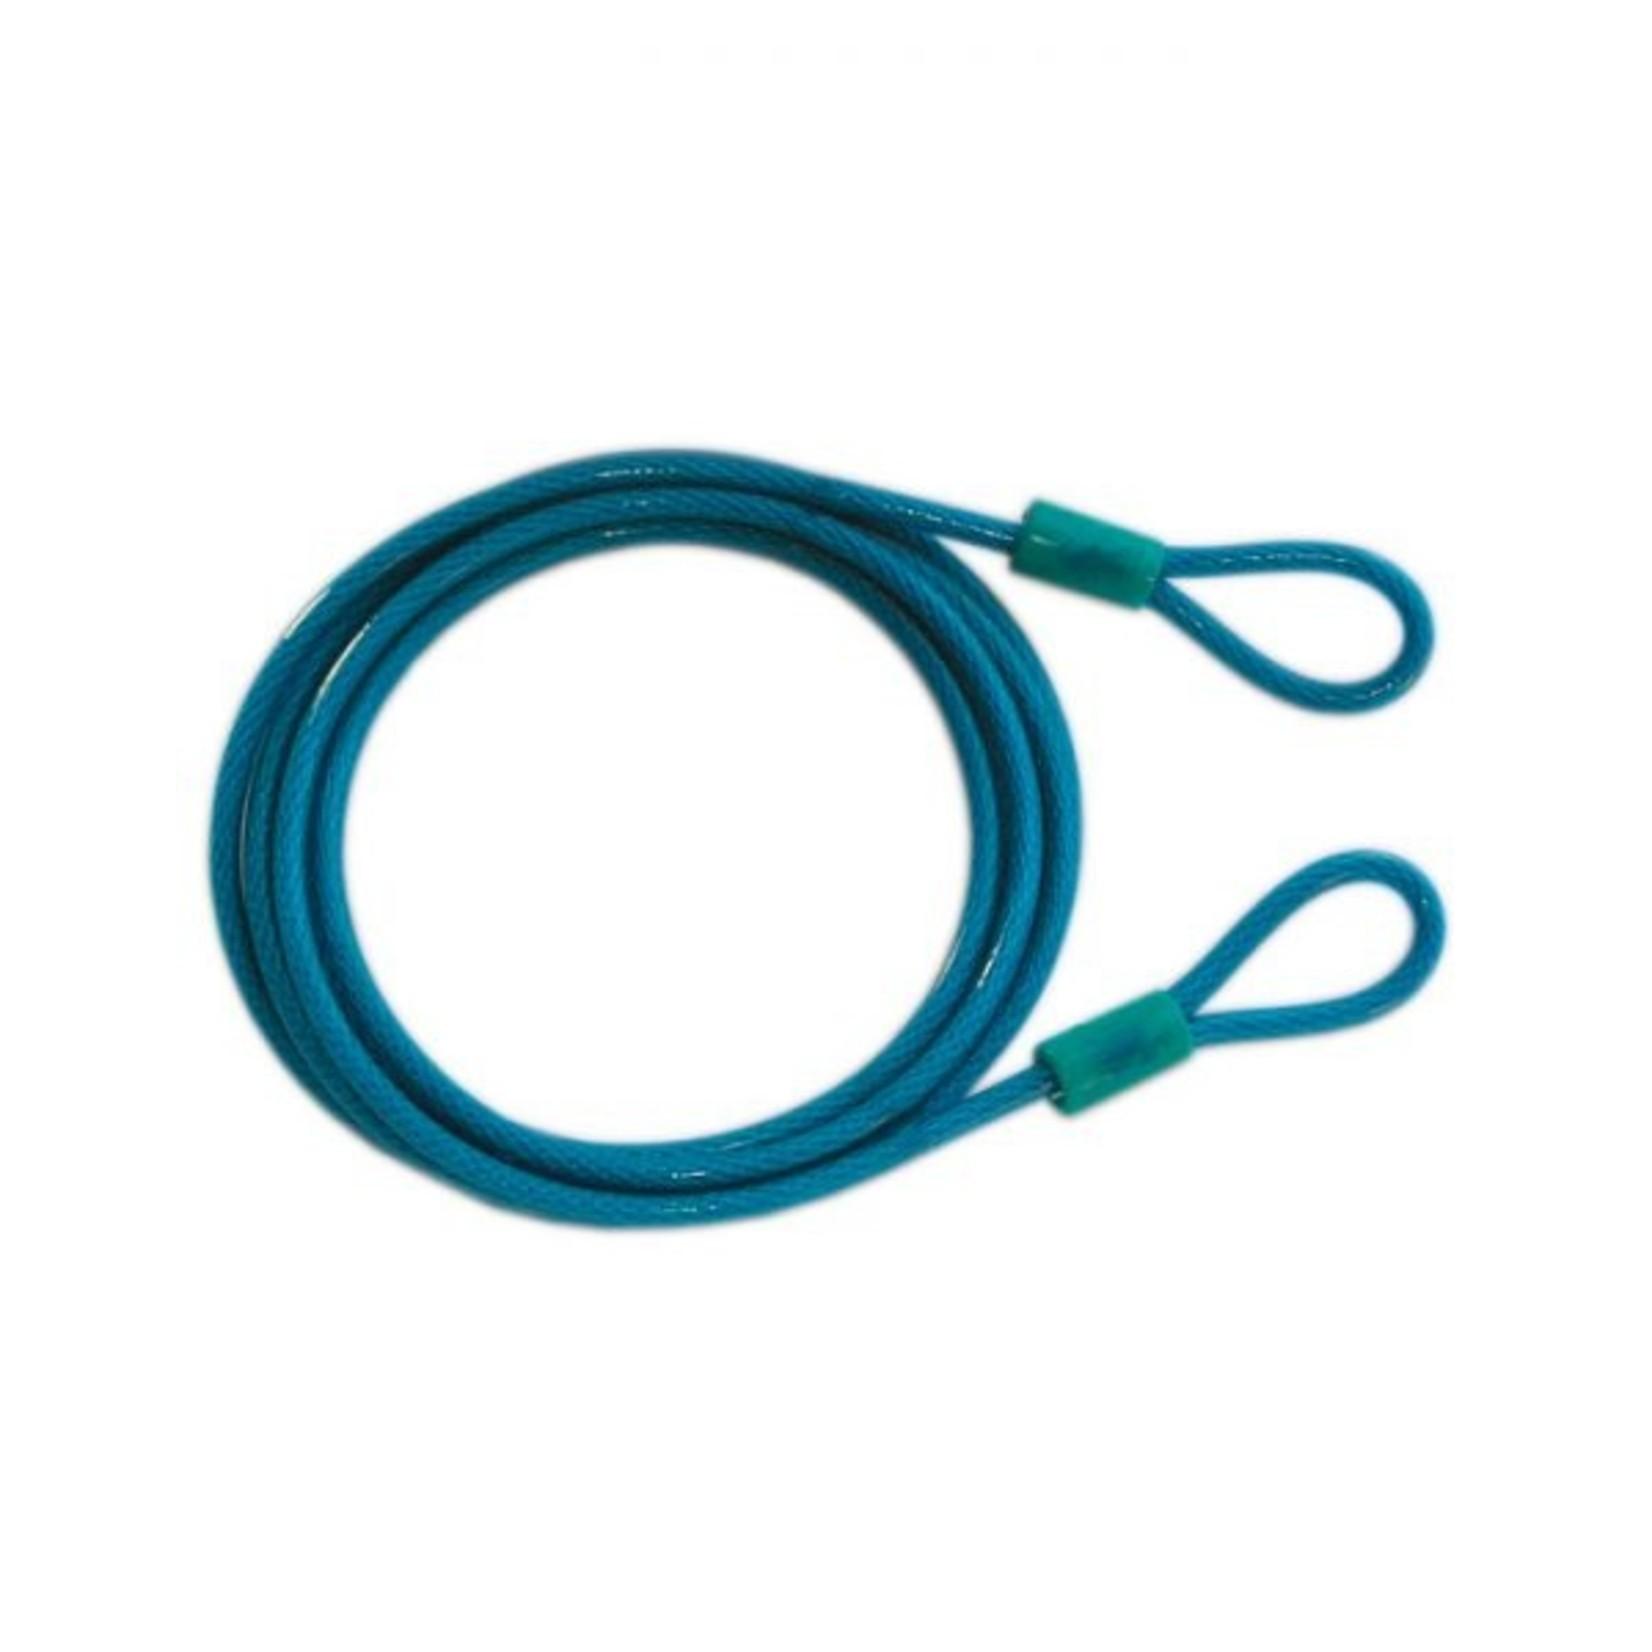 Stazo Stazo Lasso Eye Cable 20/500 - SCM certified